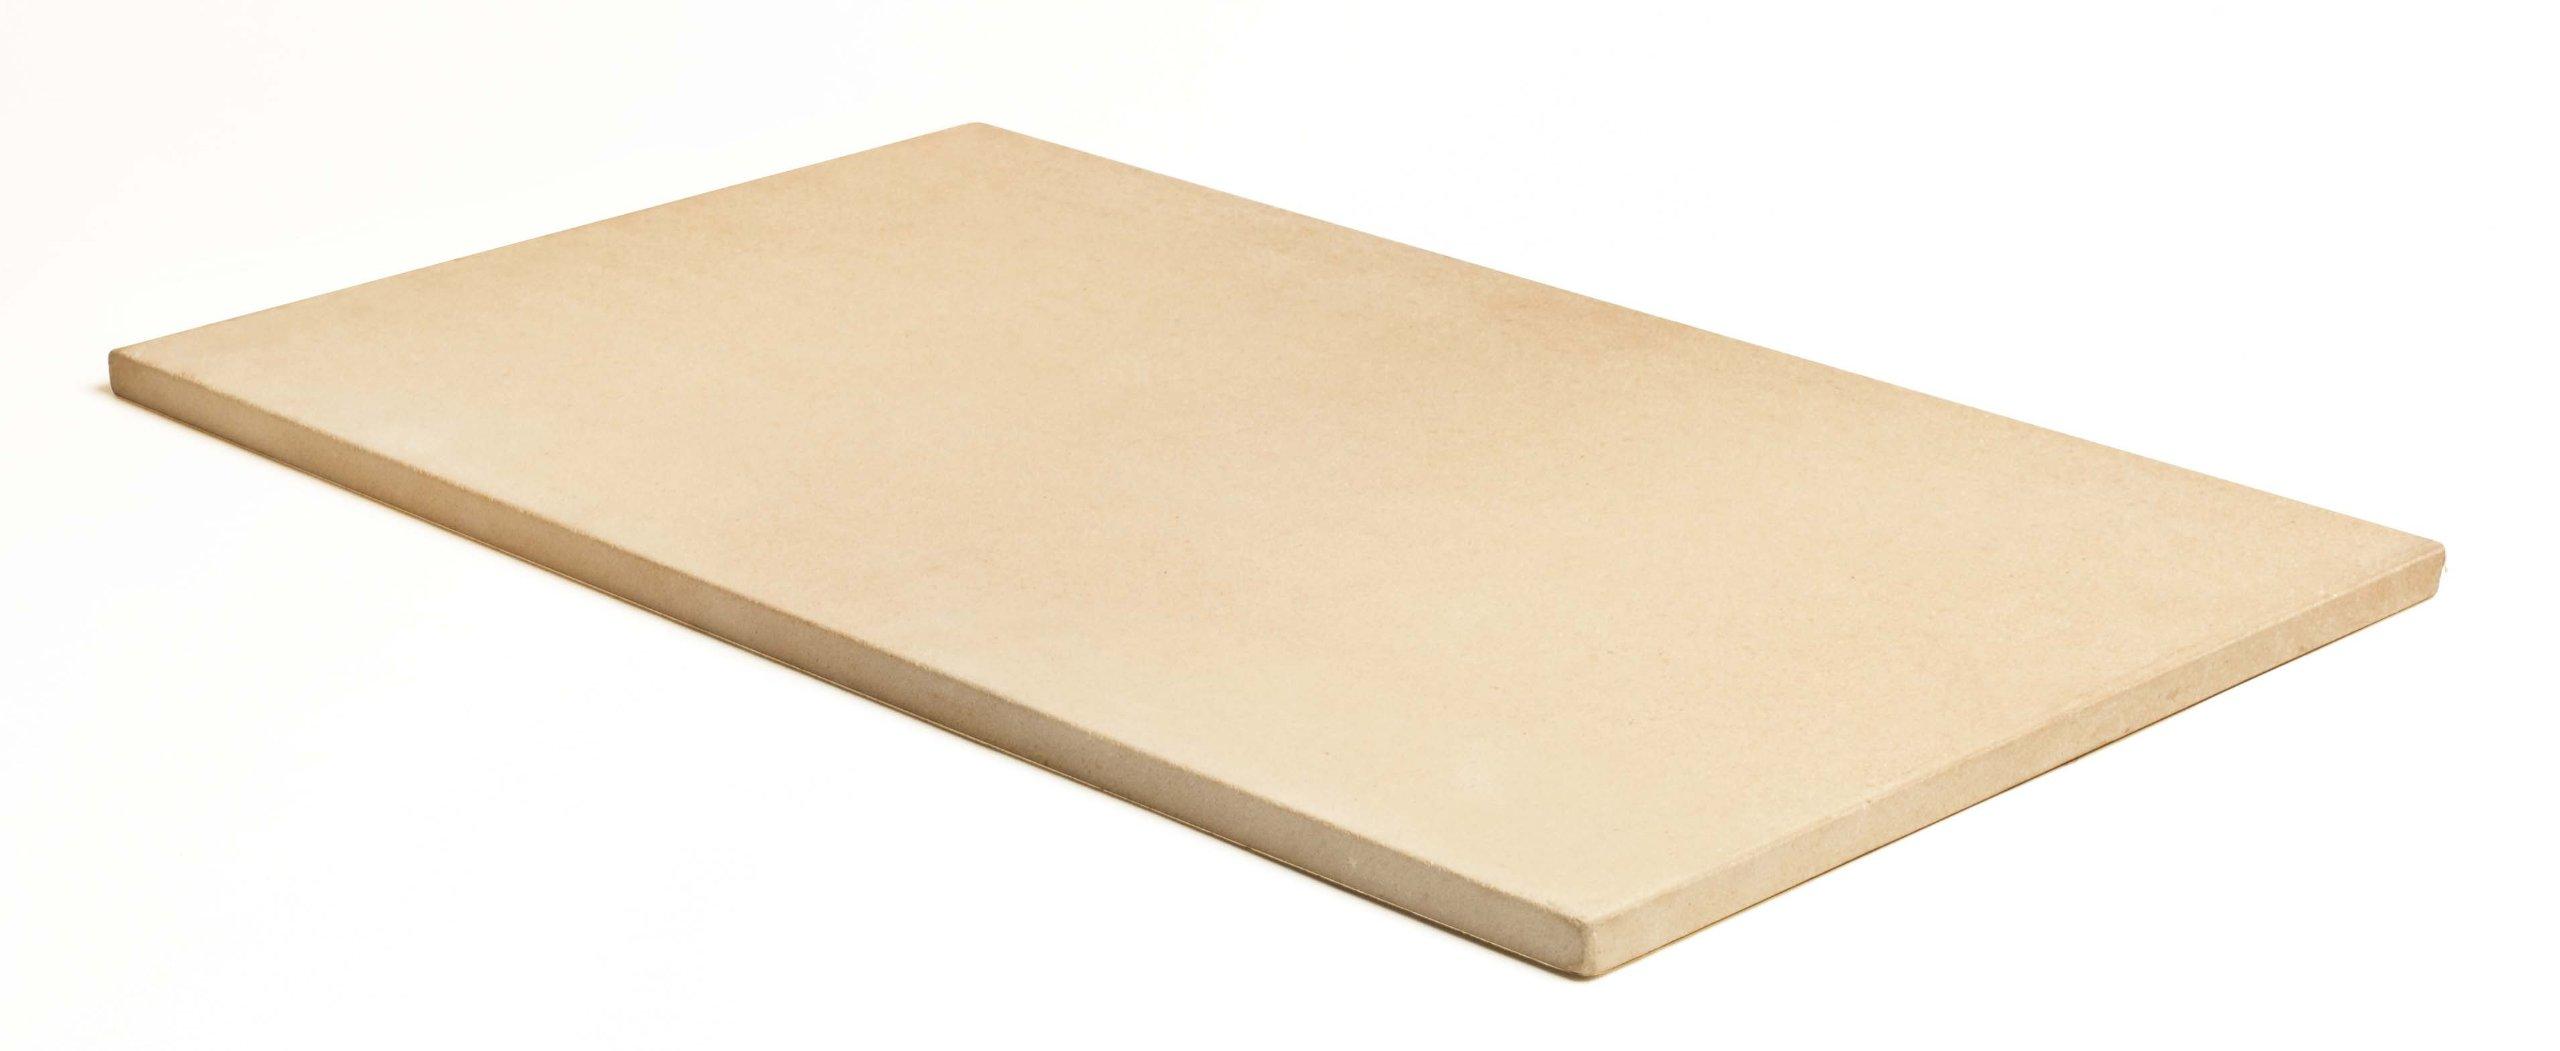 Rectangle Pizza Stones : Pizzacraft pc rectangular cordierite baking